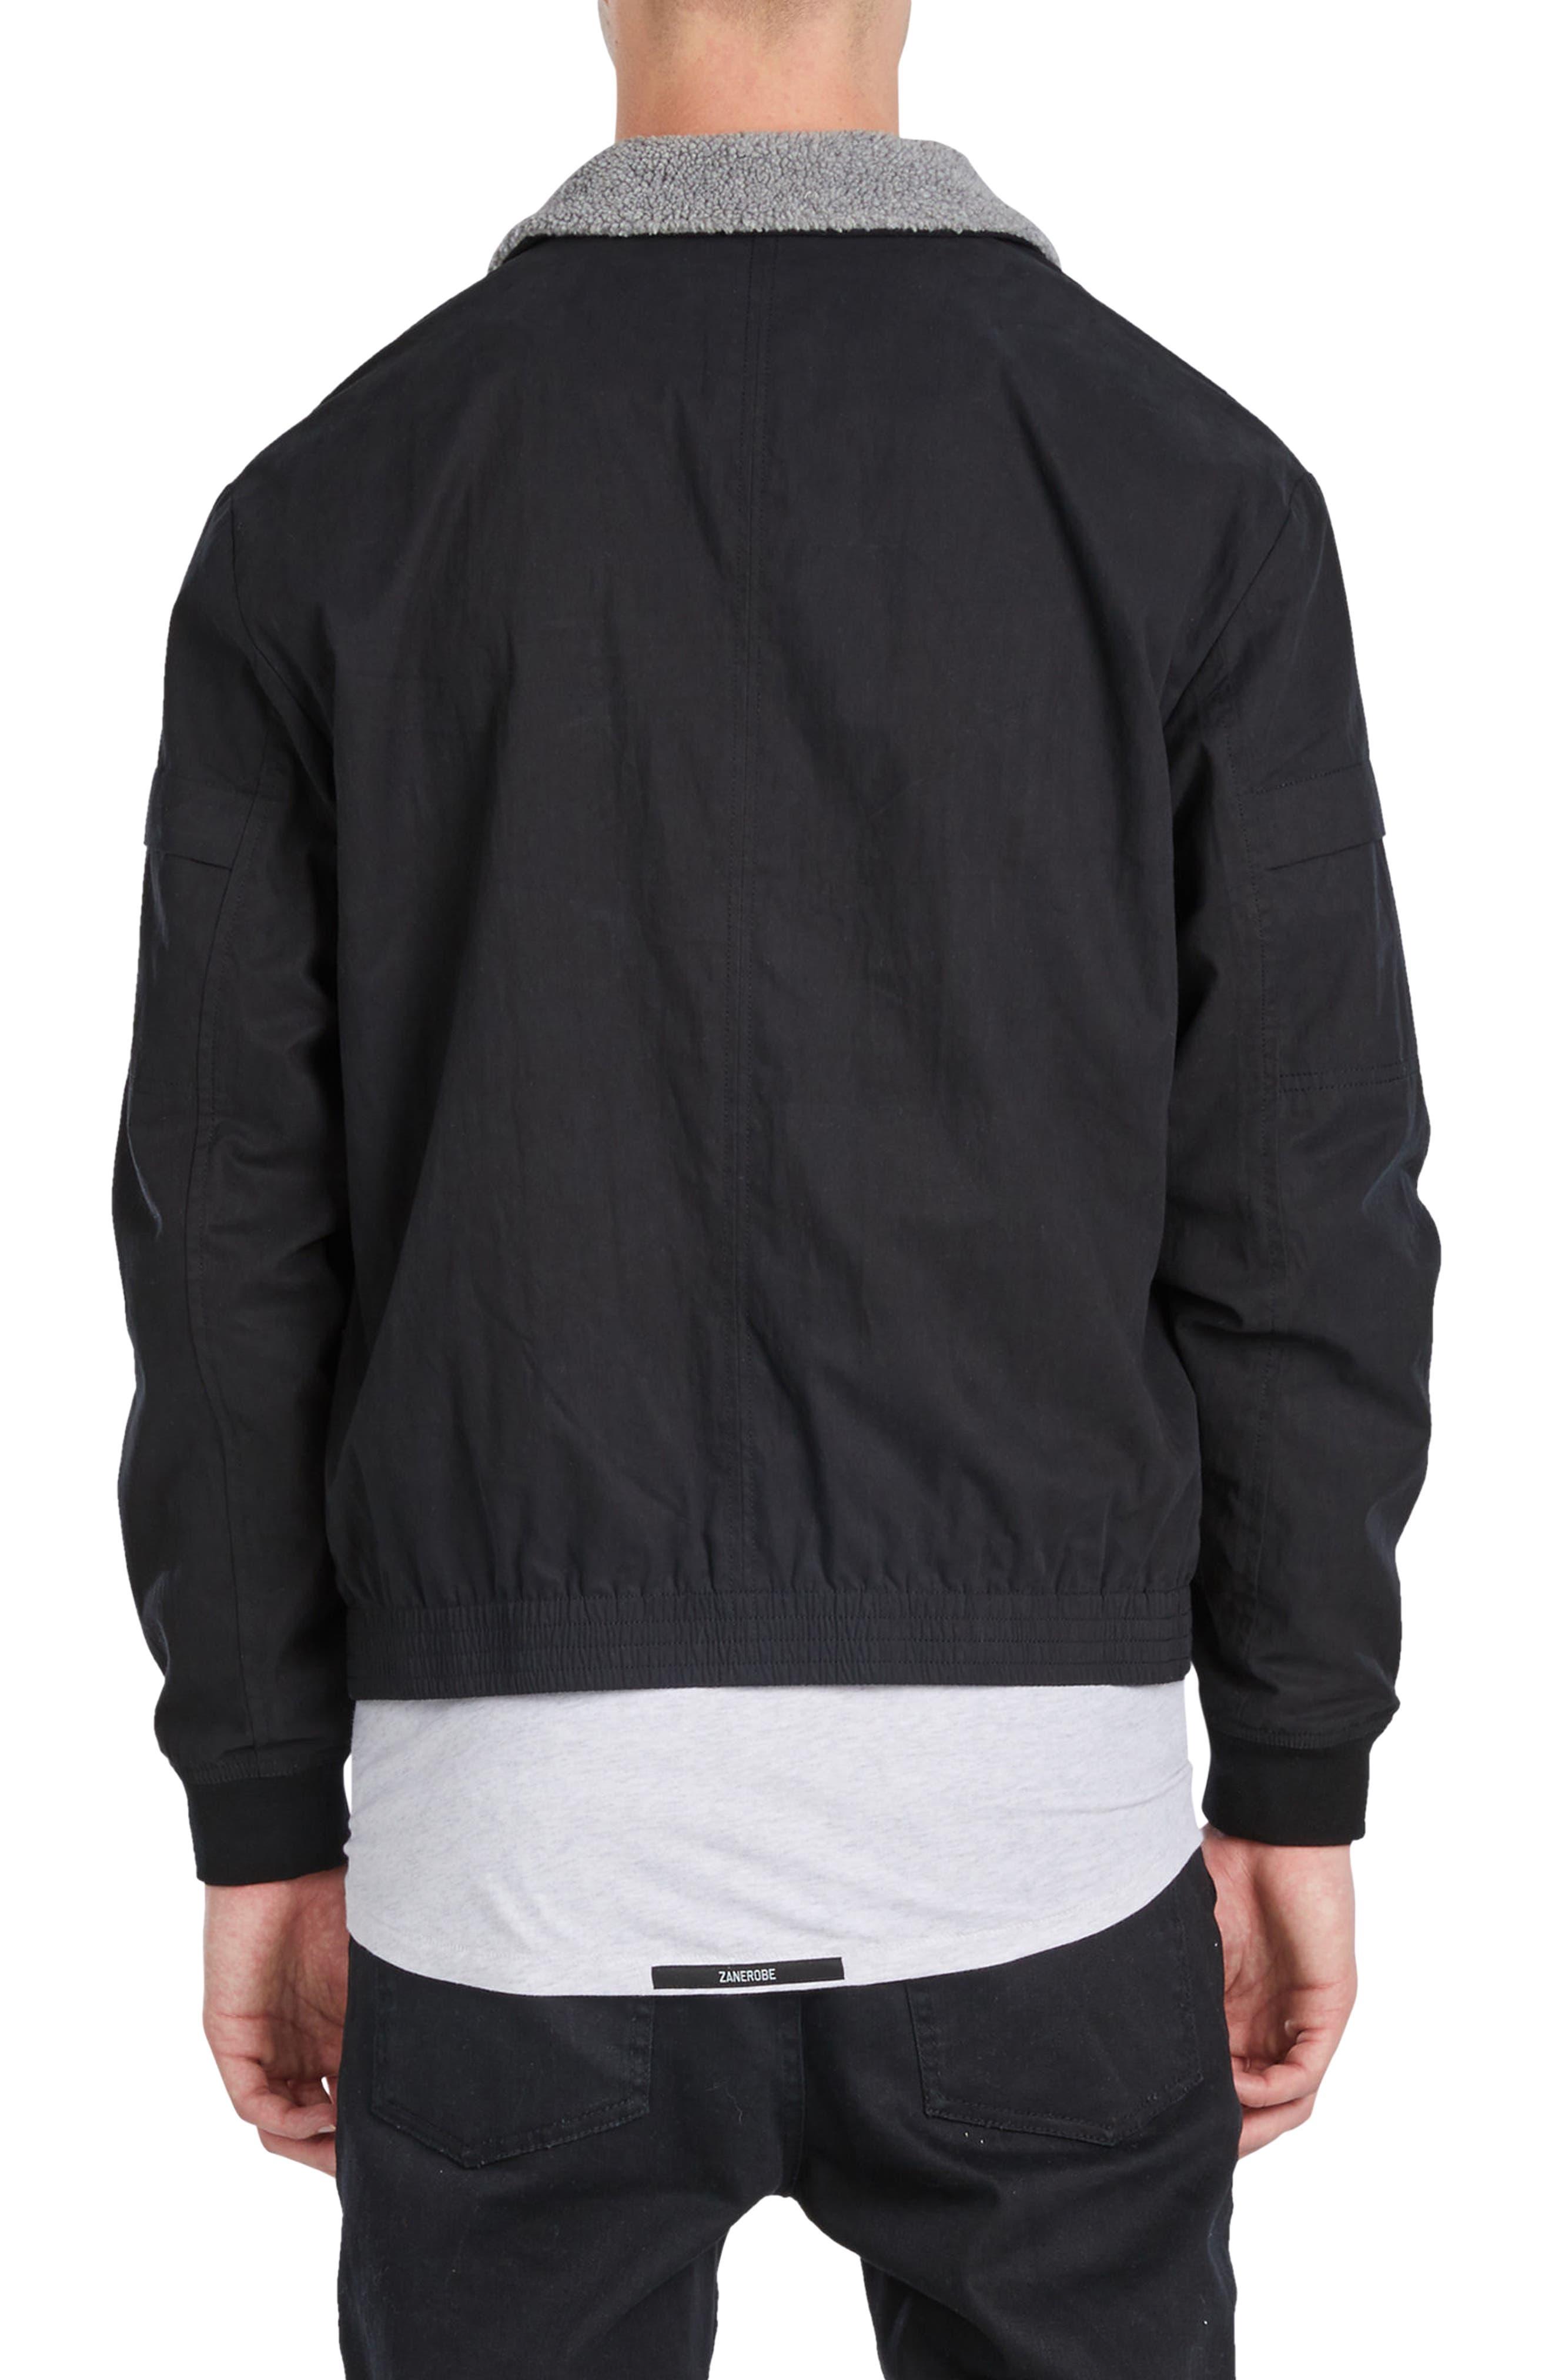 Sherpa Windbreaker Jacket,                             Alternate thumbnail 2, color,                             001